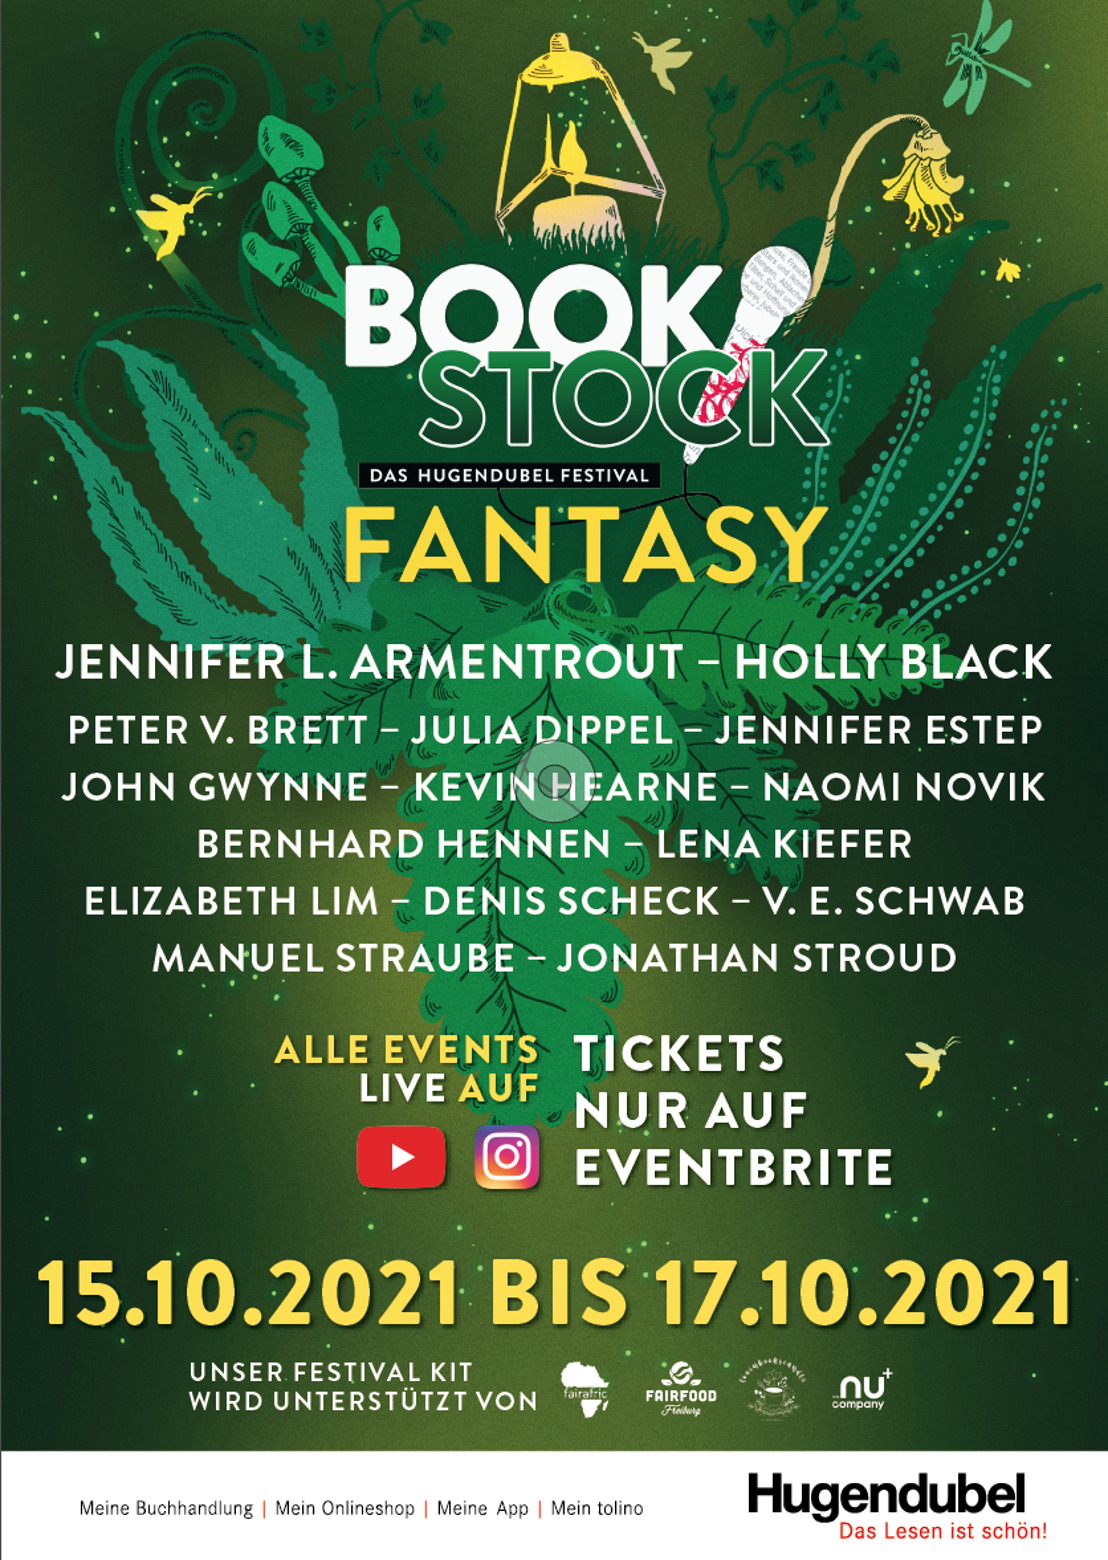 Hugendubel startet zweites digitales BOOKSTOCK-Festival